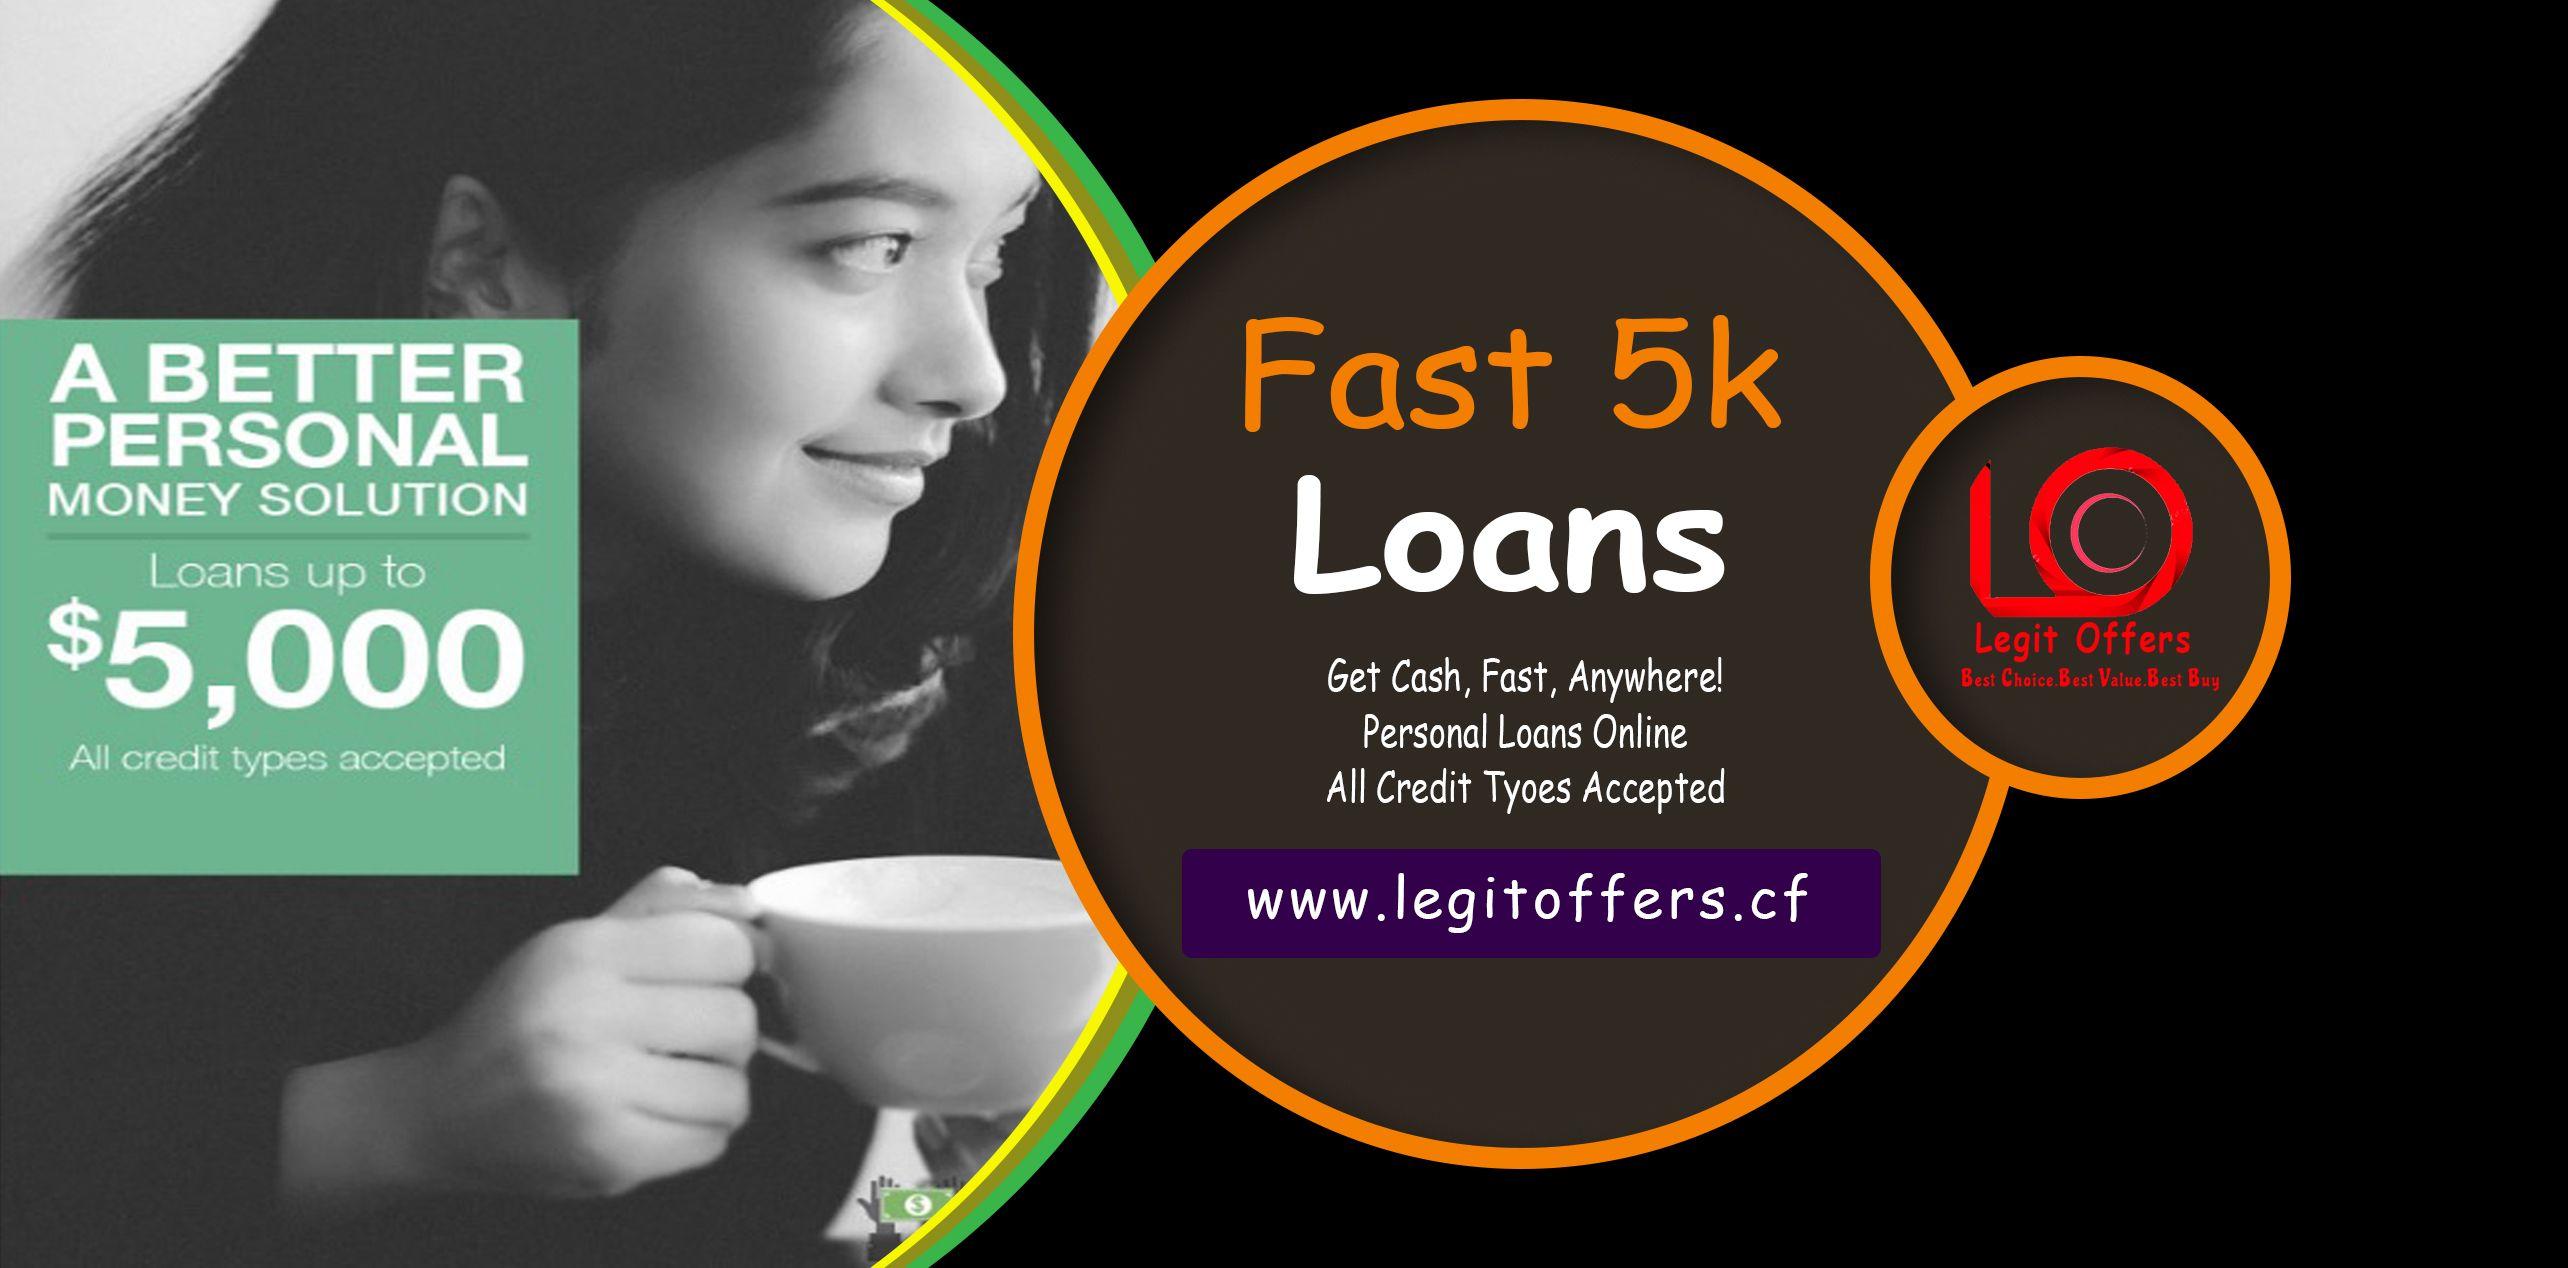 b7b5000215bb69ac01208c053f72bd95 - How To Get A Loan If You Are Under 18